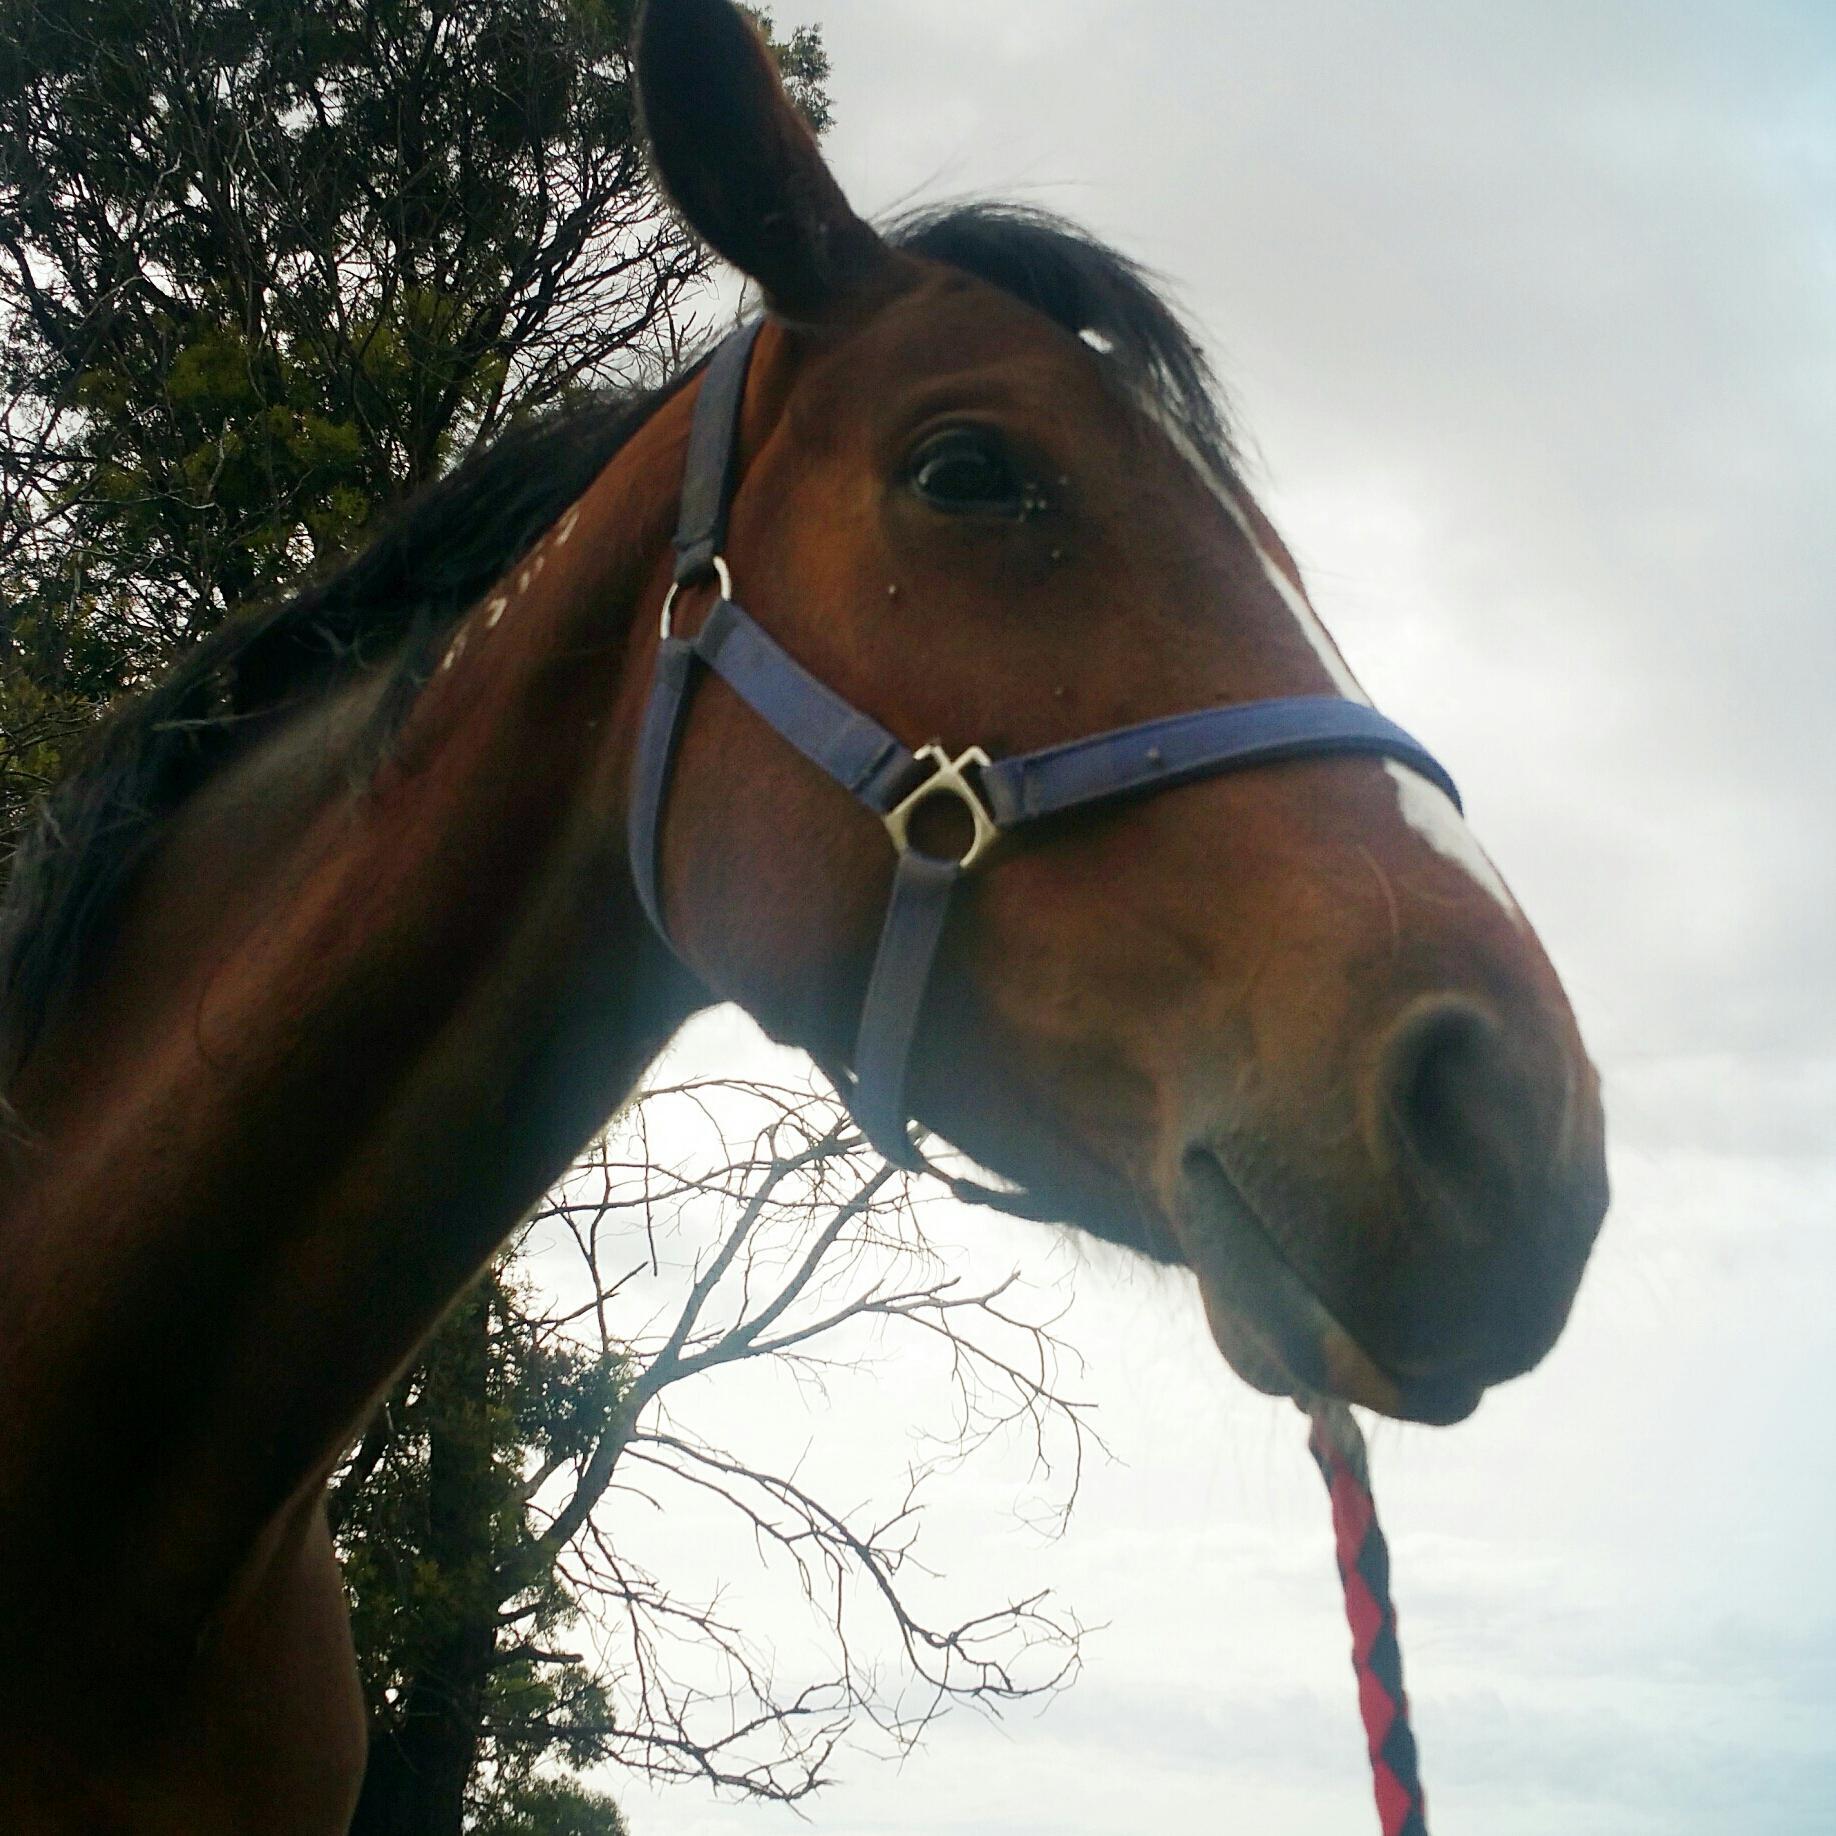 15hh standardbred bay mare